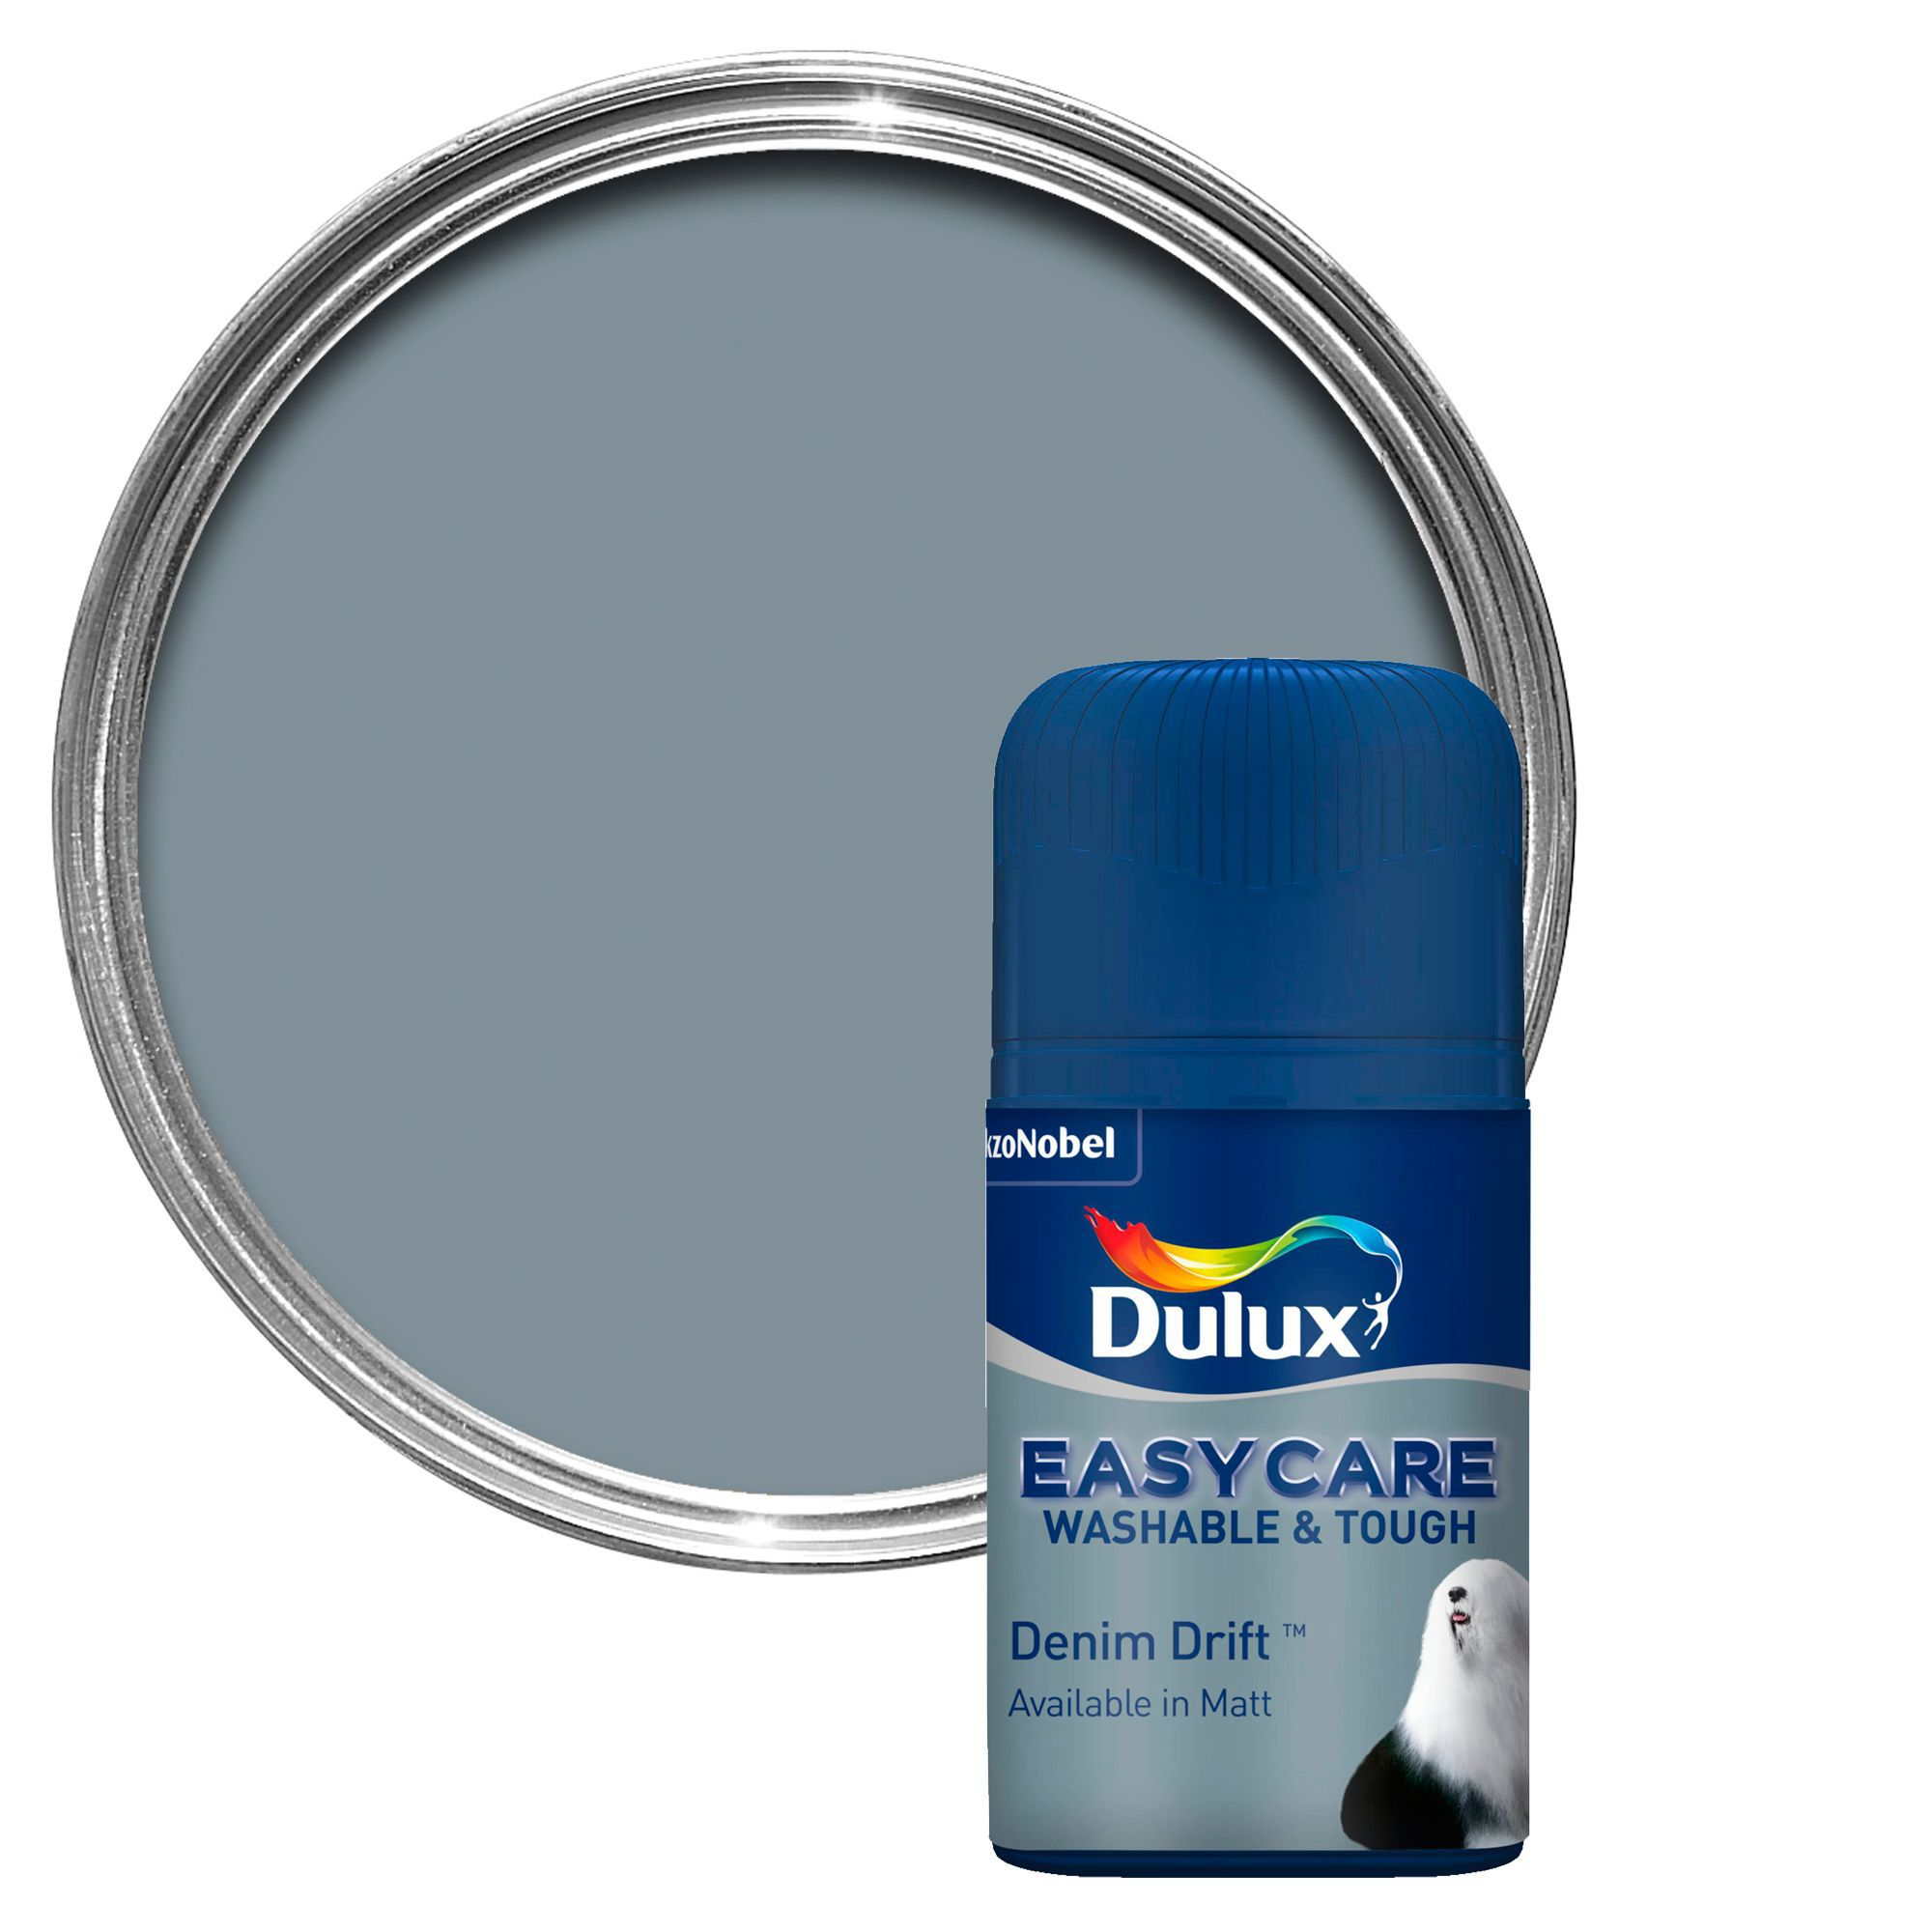 dulux easycare denim drift matt emulsion paint. Black Bedroom Furniture Sets. Home Design Ideas